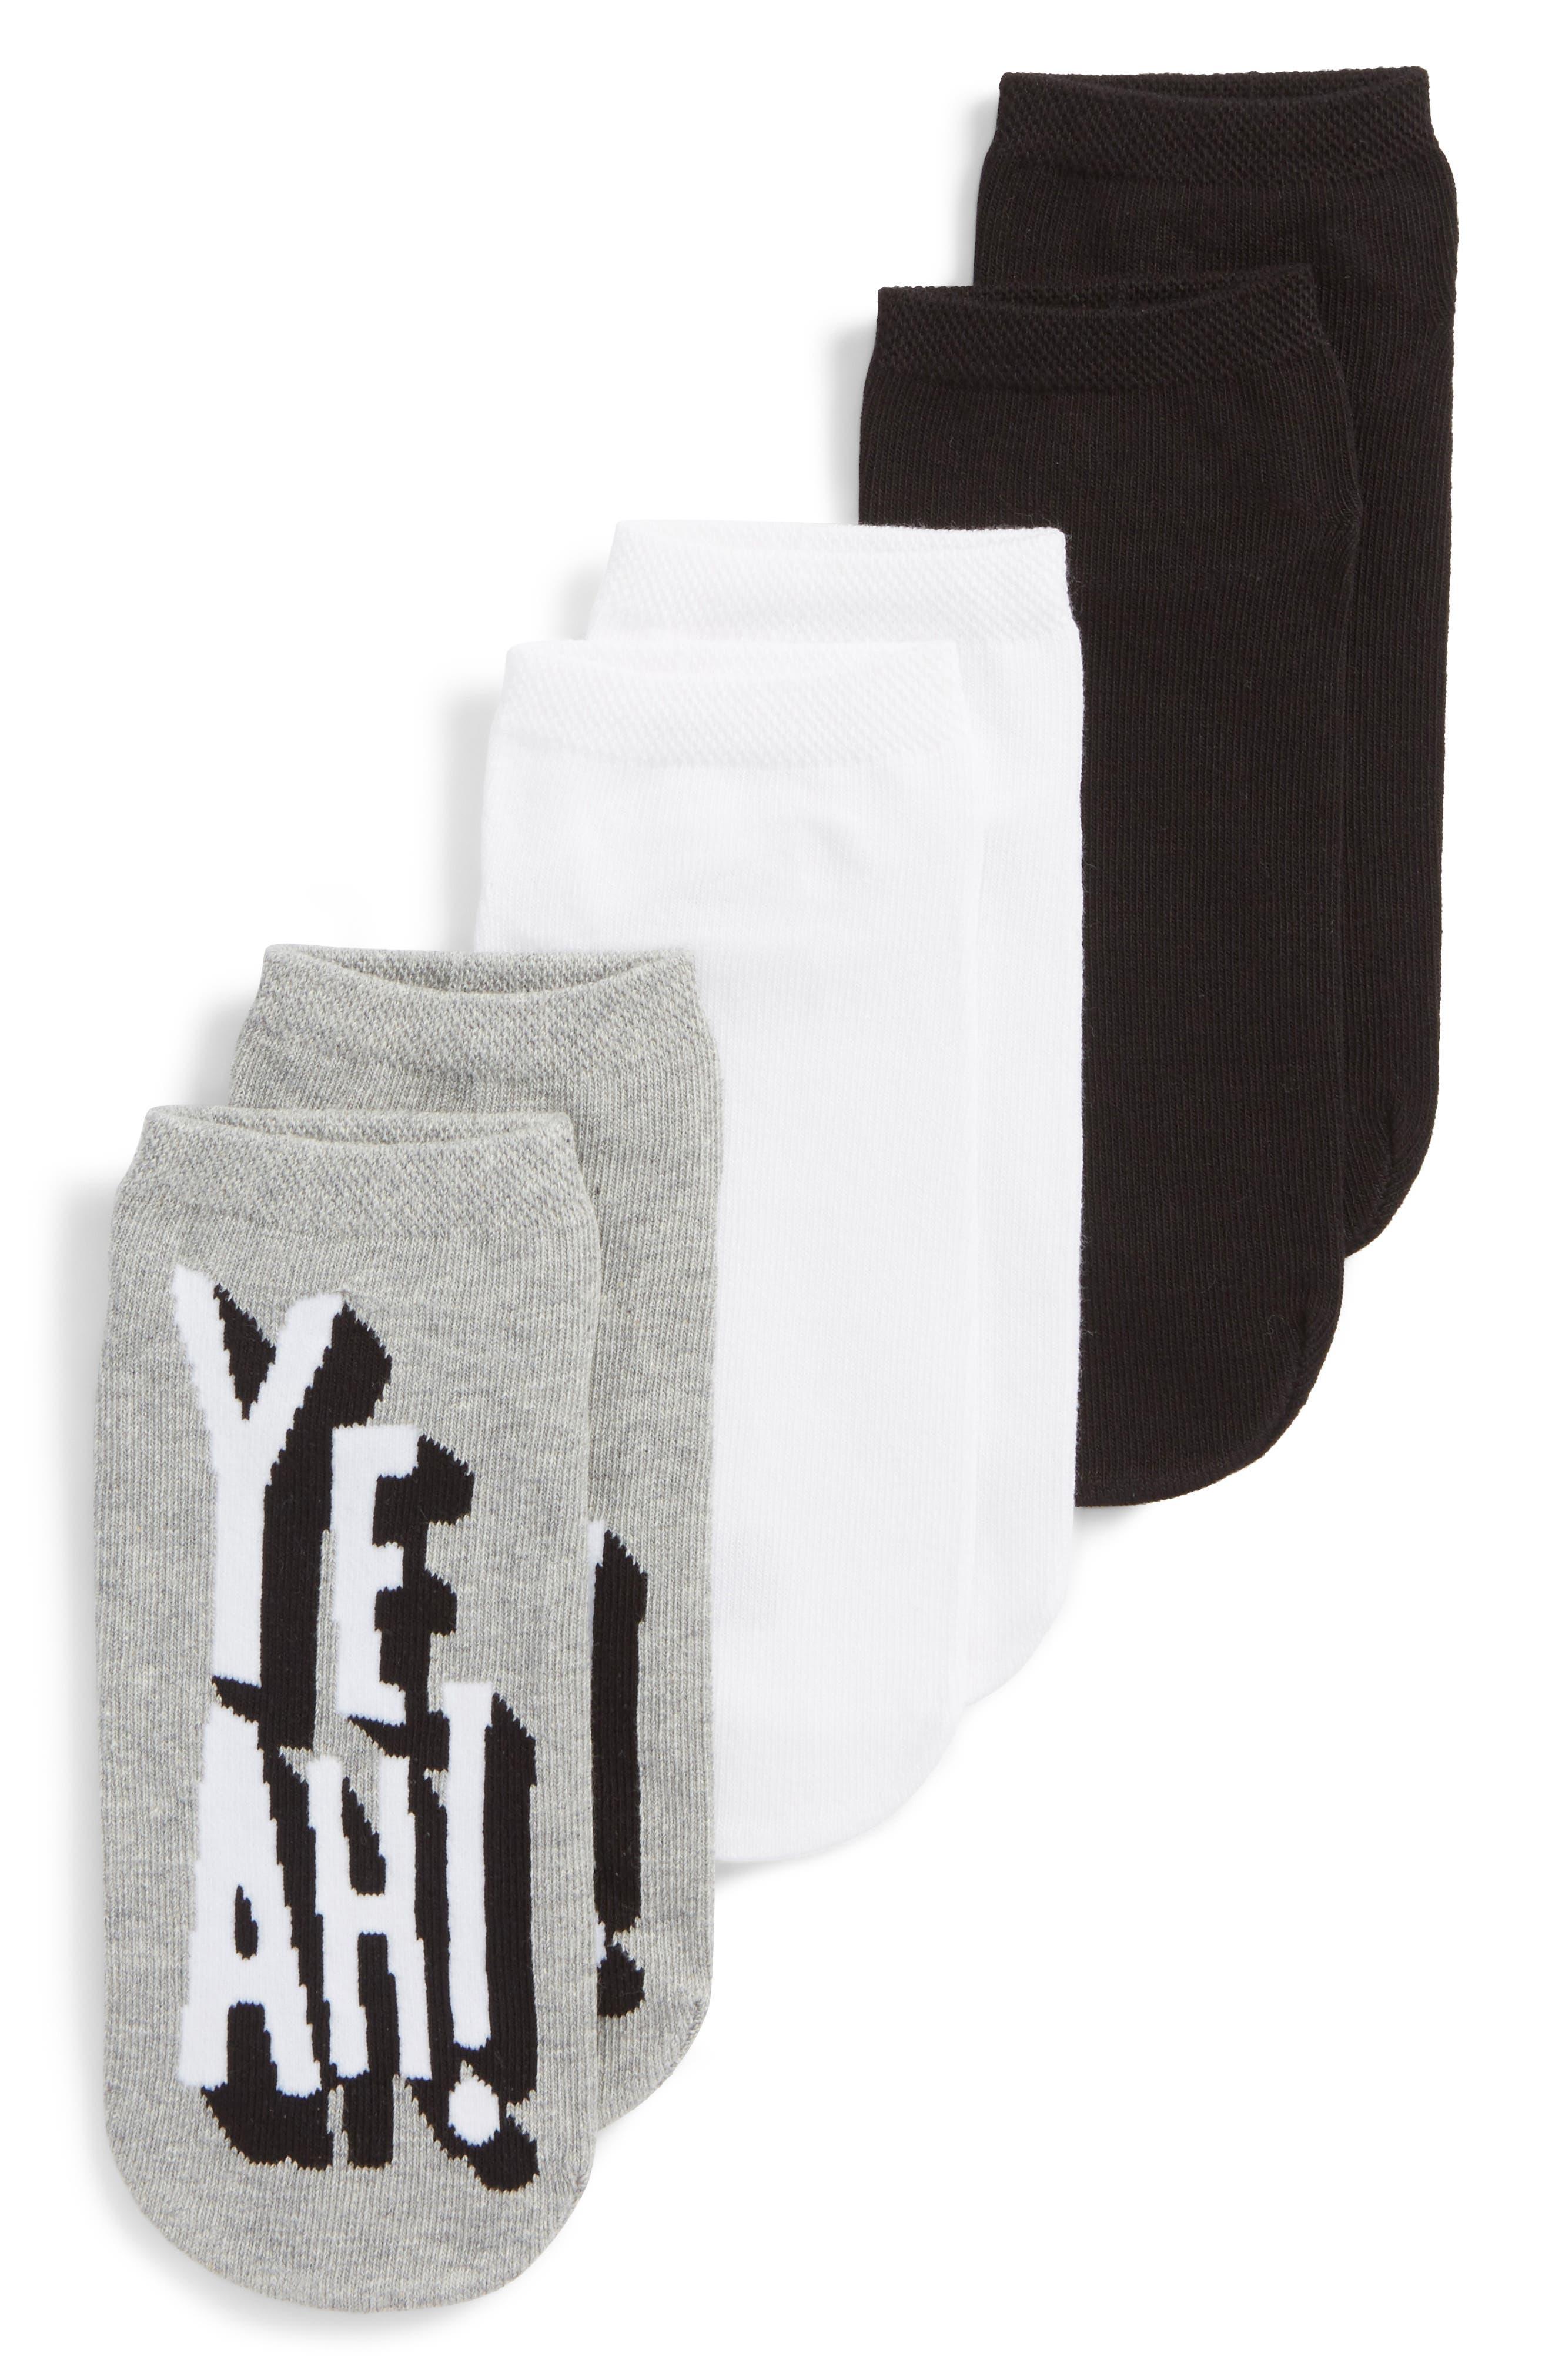 Yeah Footsie 3-Pack Socks,                             Main thumbnail 1, color,                             Light Charcoal Heather